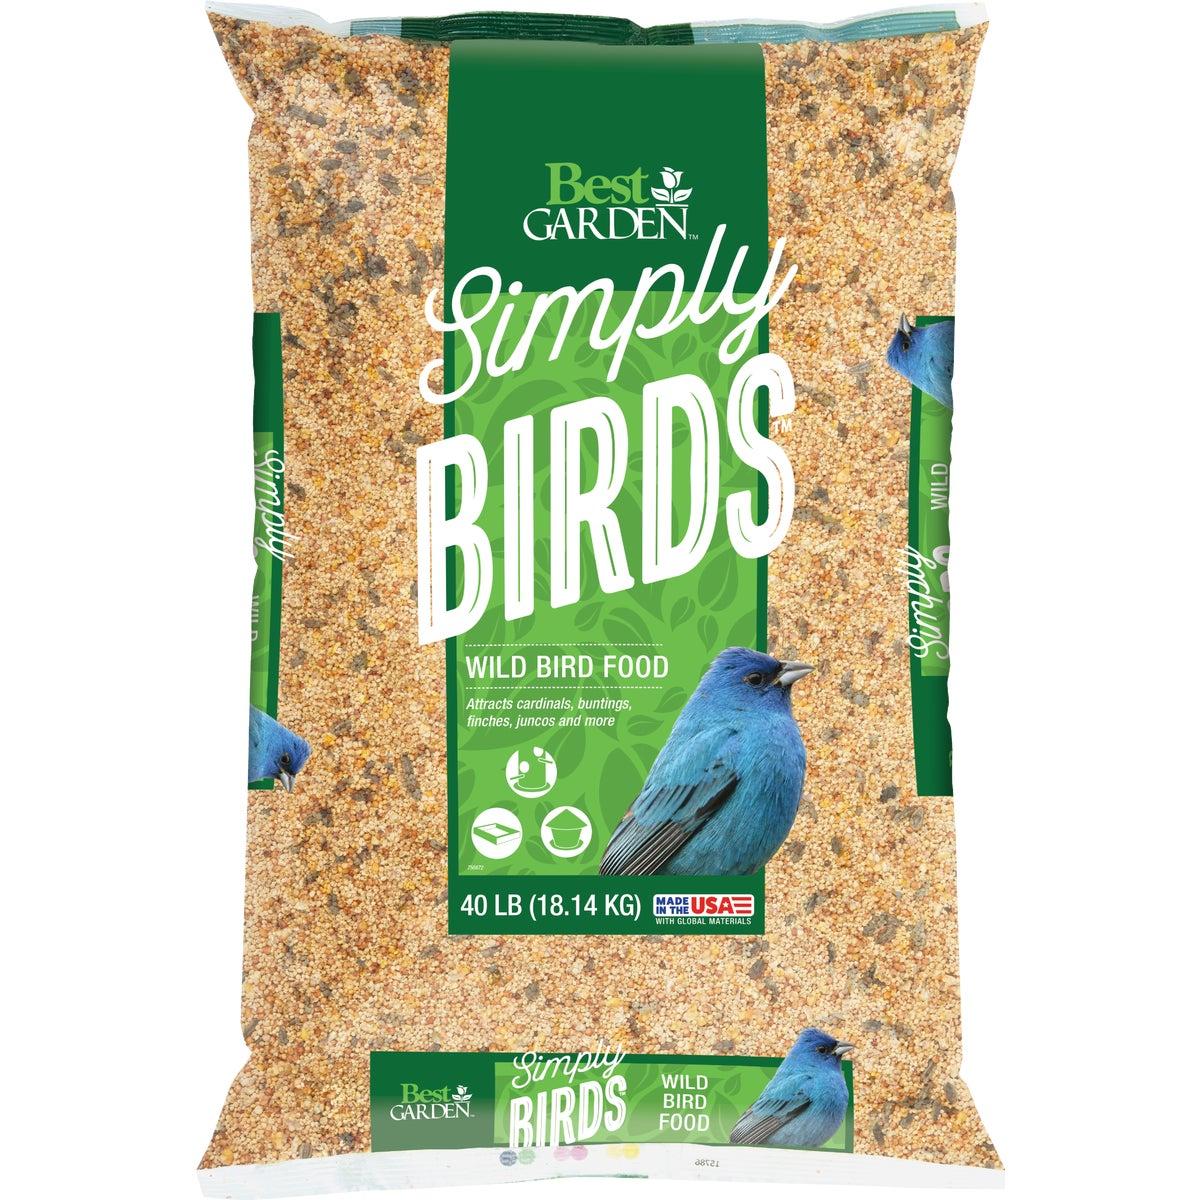 40LB WILD BIRD SEED